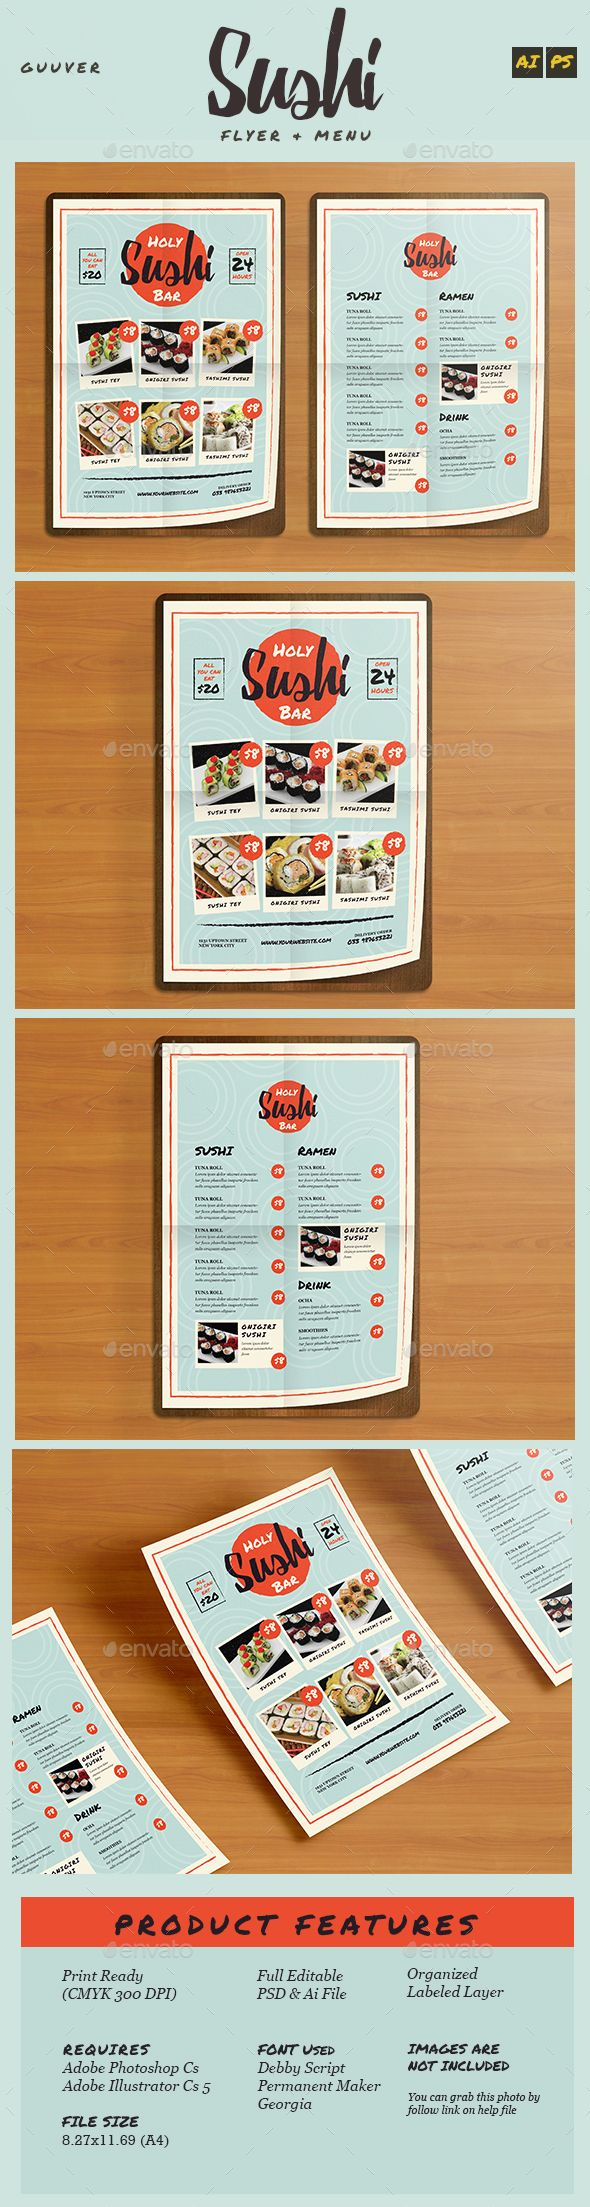 Sushi Bar Restaurant Menu / Flyer Template PSD, Vector AI #design Download: http://graphicriver.net/item/sushi-bar-restaurant-menuflyer/14467529?ref=ksioks